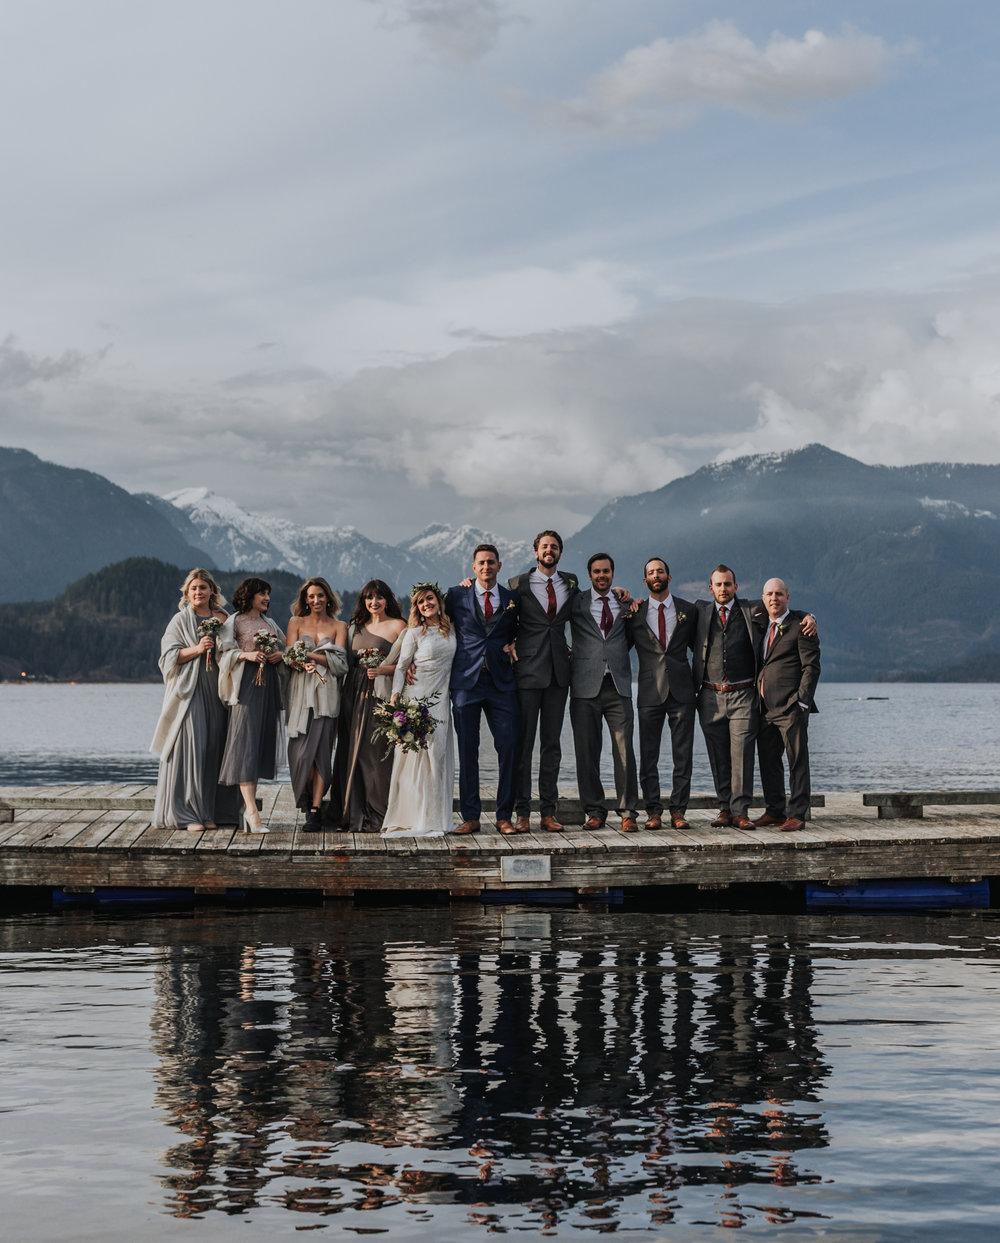 Sunshine Coast Wedding Photos - Mountain Wedding Photos - Sunshine Coast Wedding Photographer - Vancouver Wedding Photographer - Jennifer Picard315-1.JPG